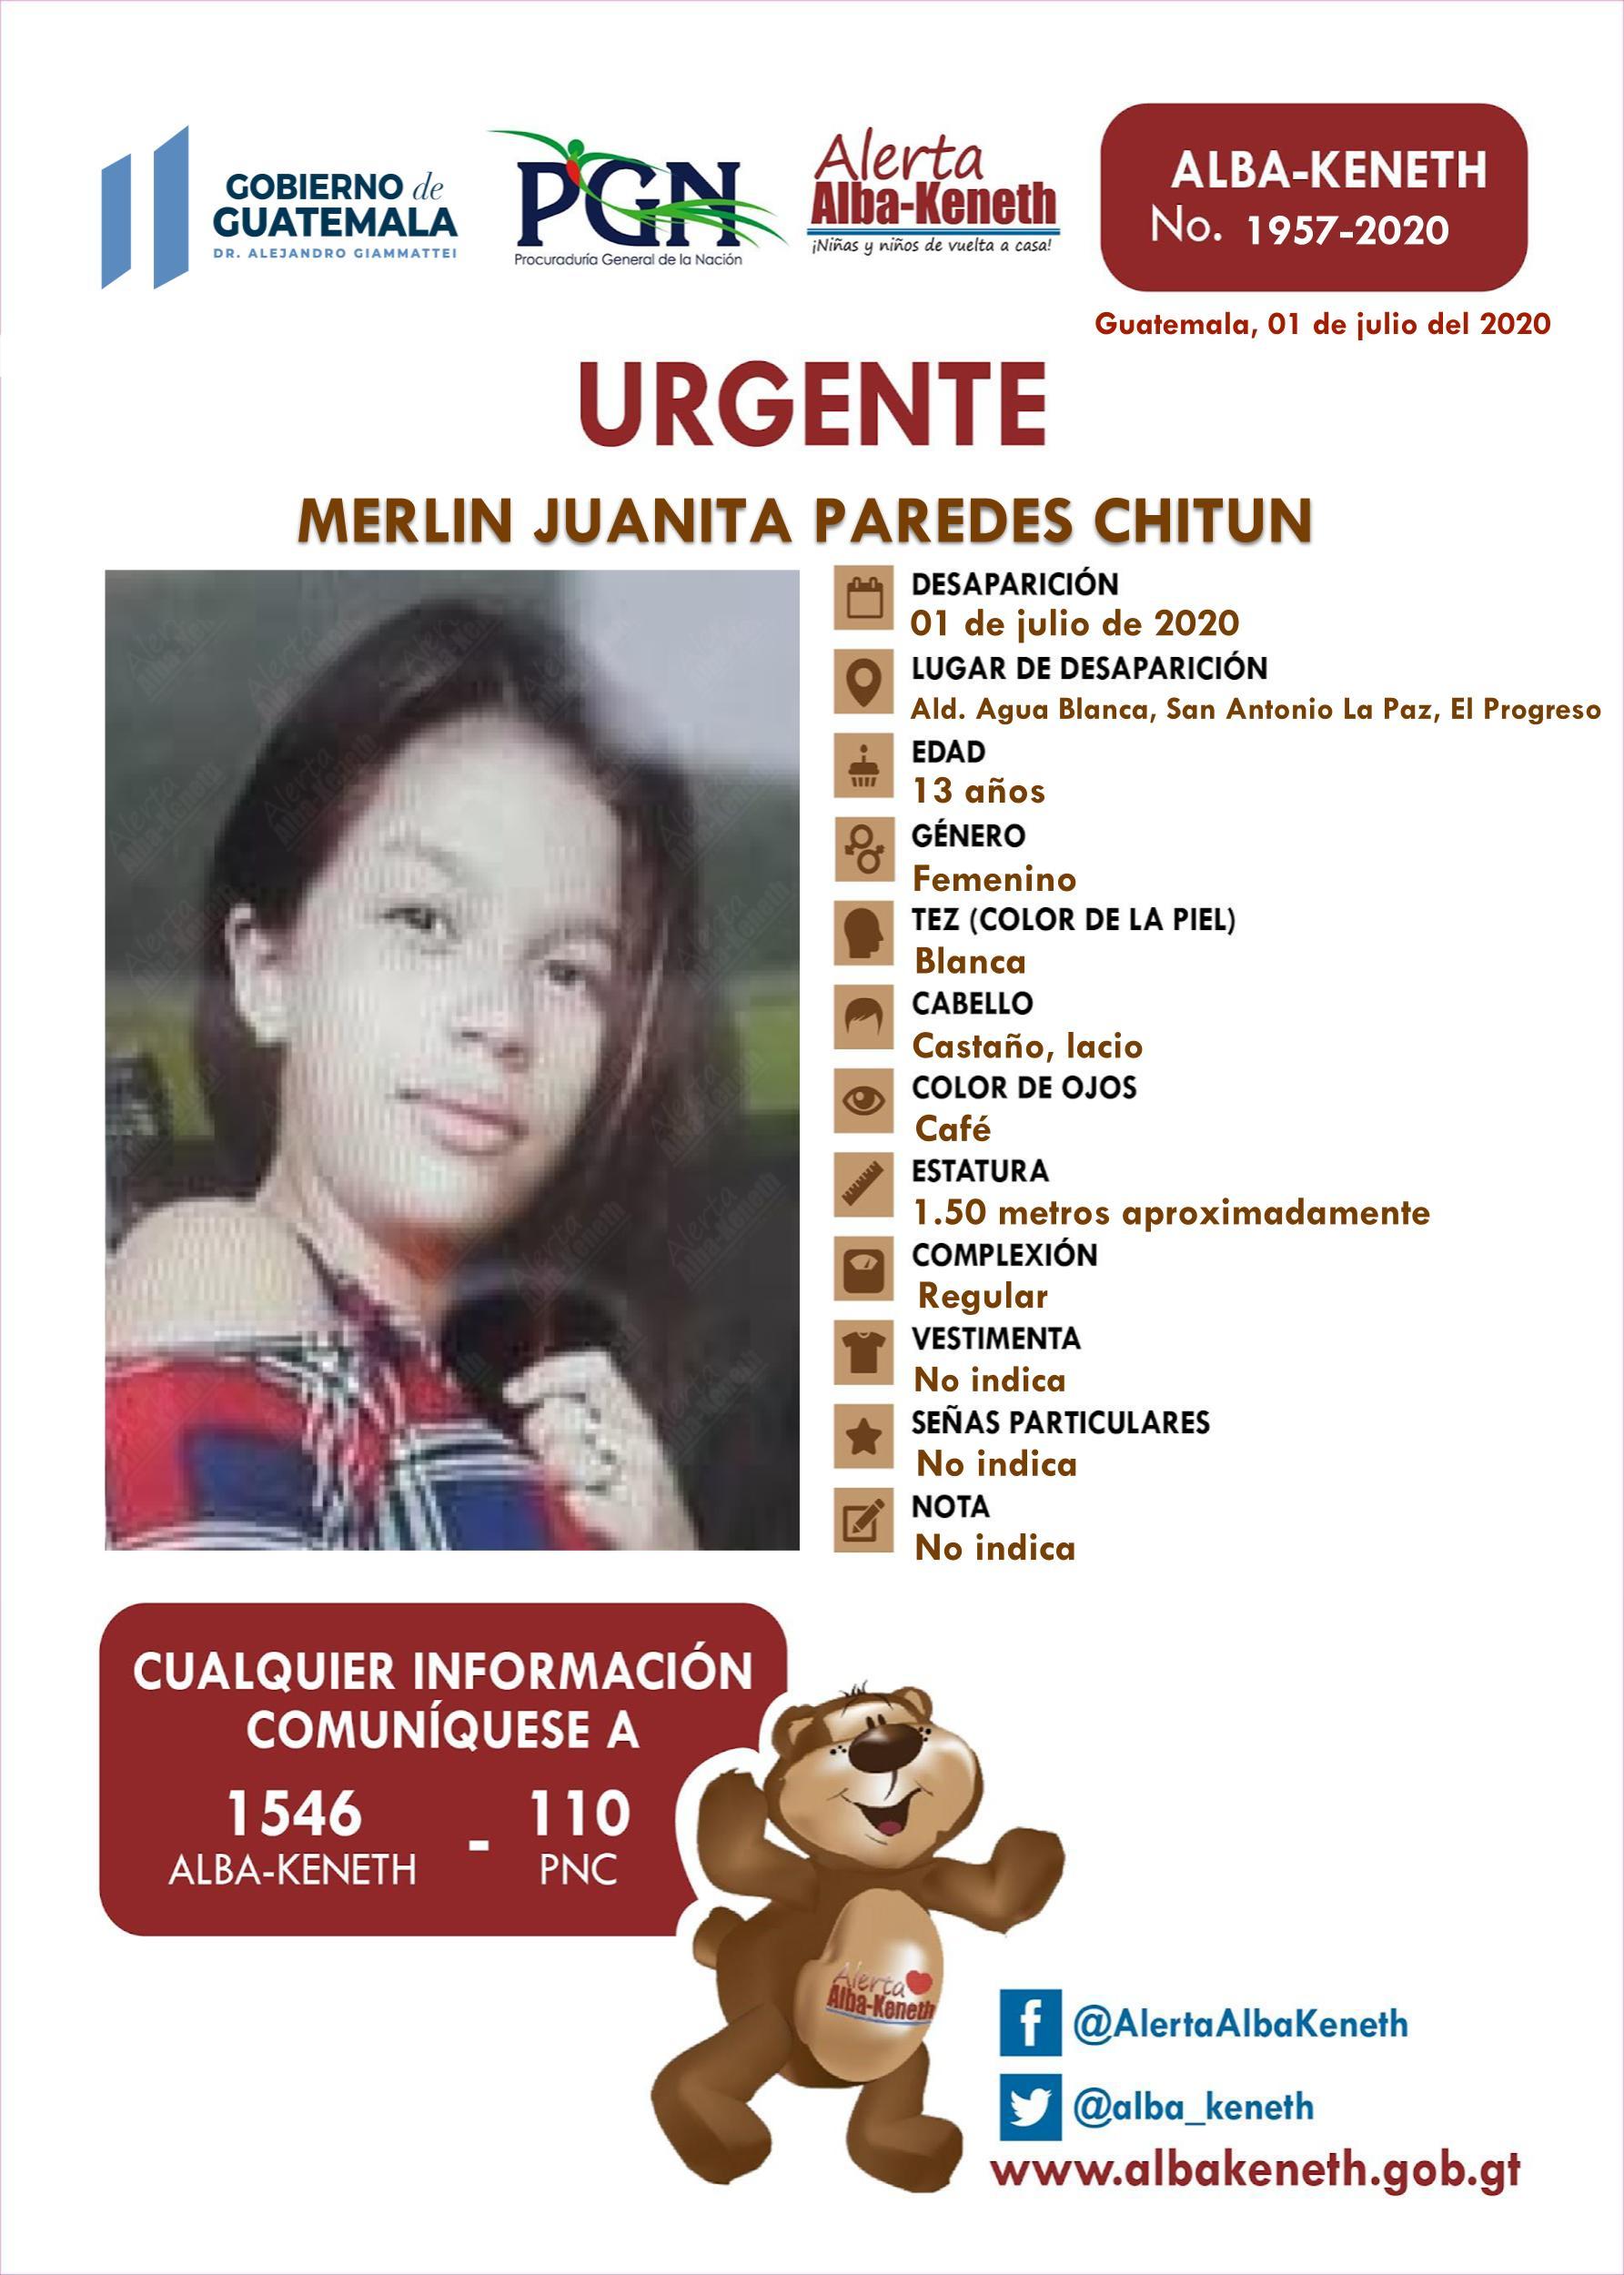 Merlin Juanita Paredes Chitun